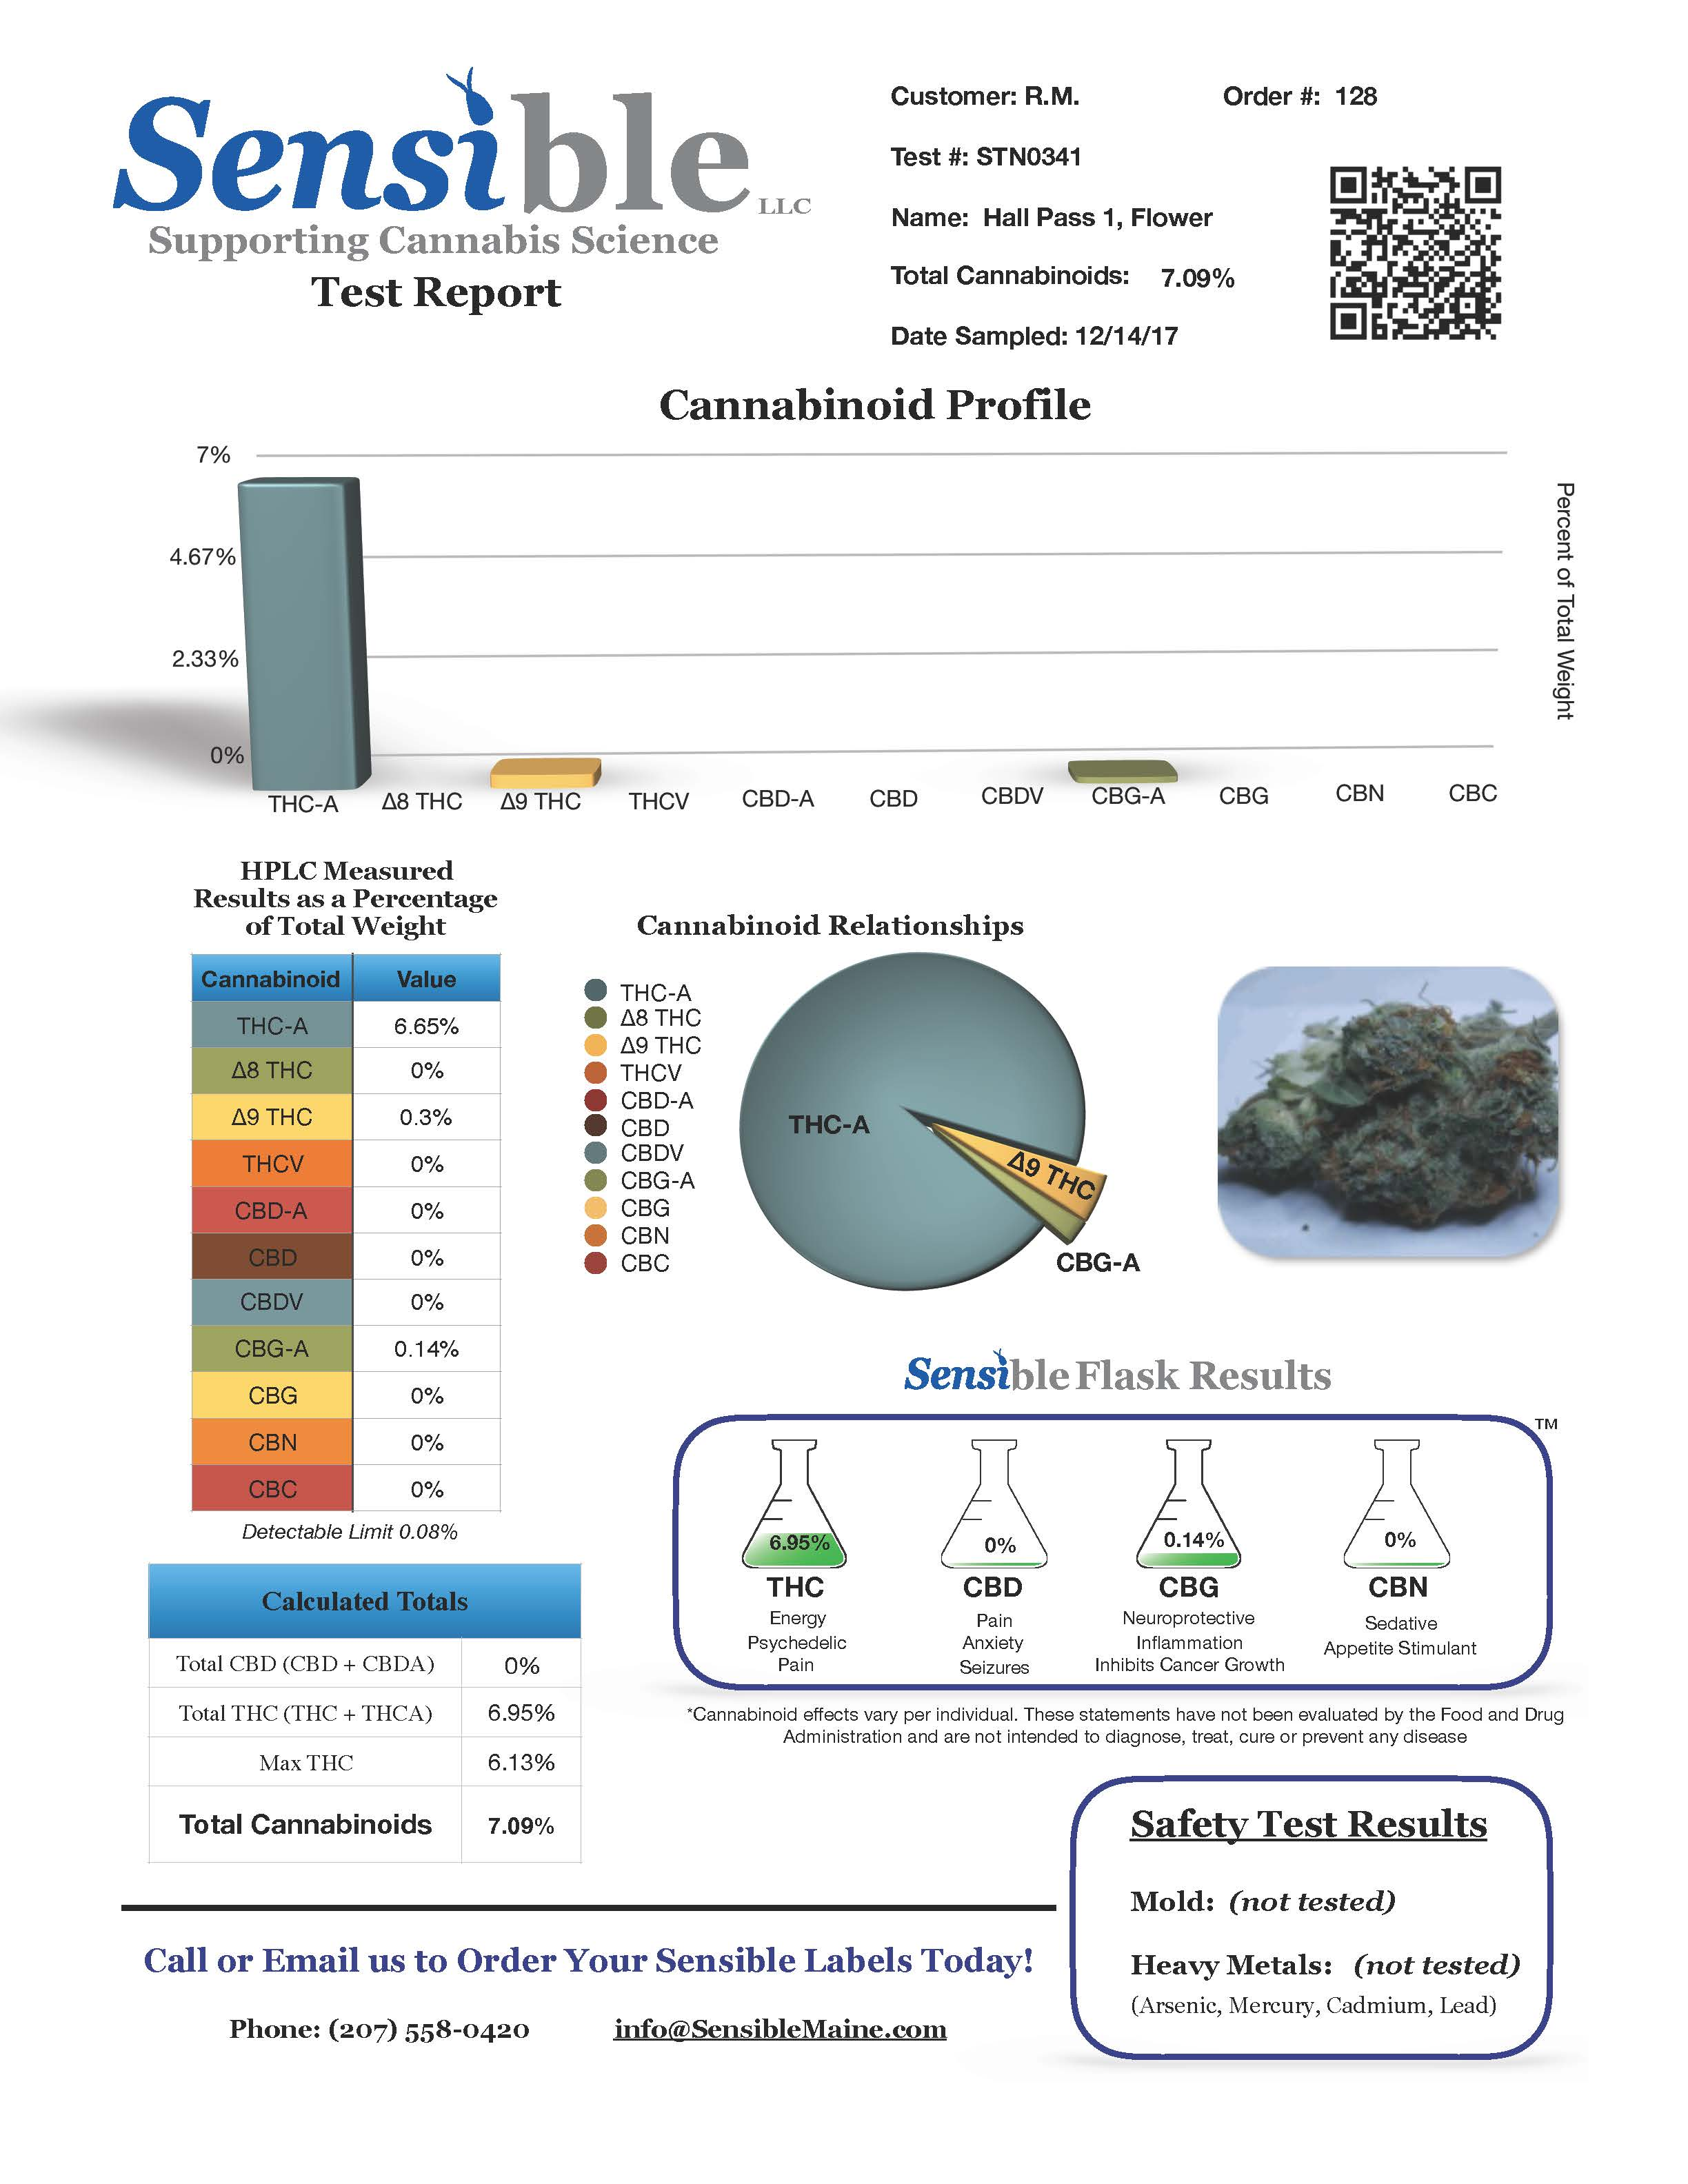 Test Report stn0341.jpg